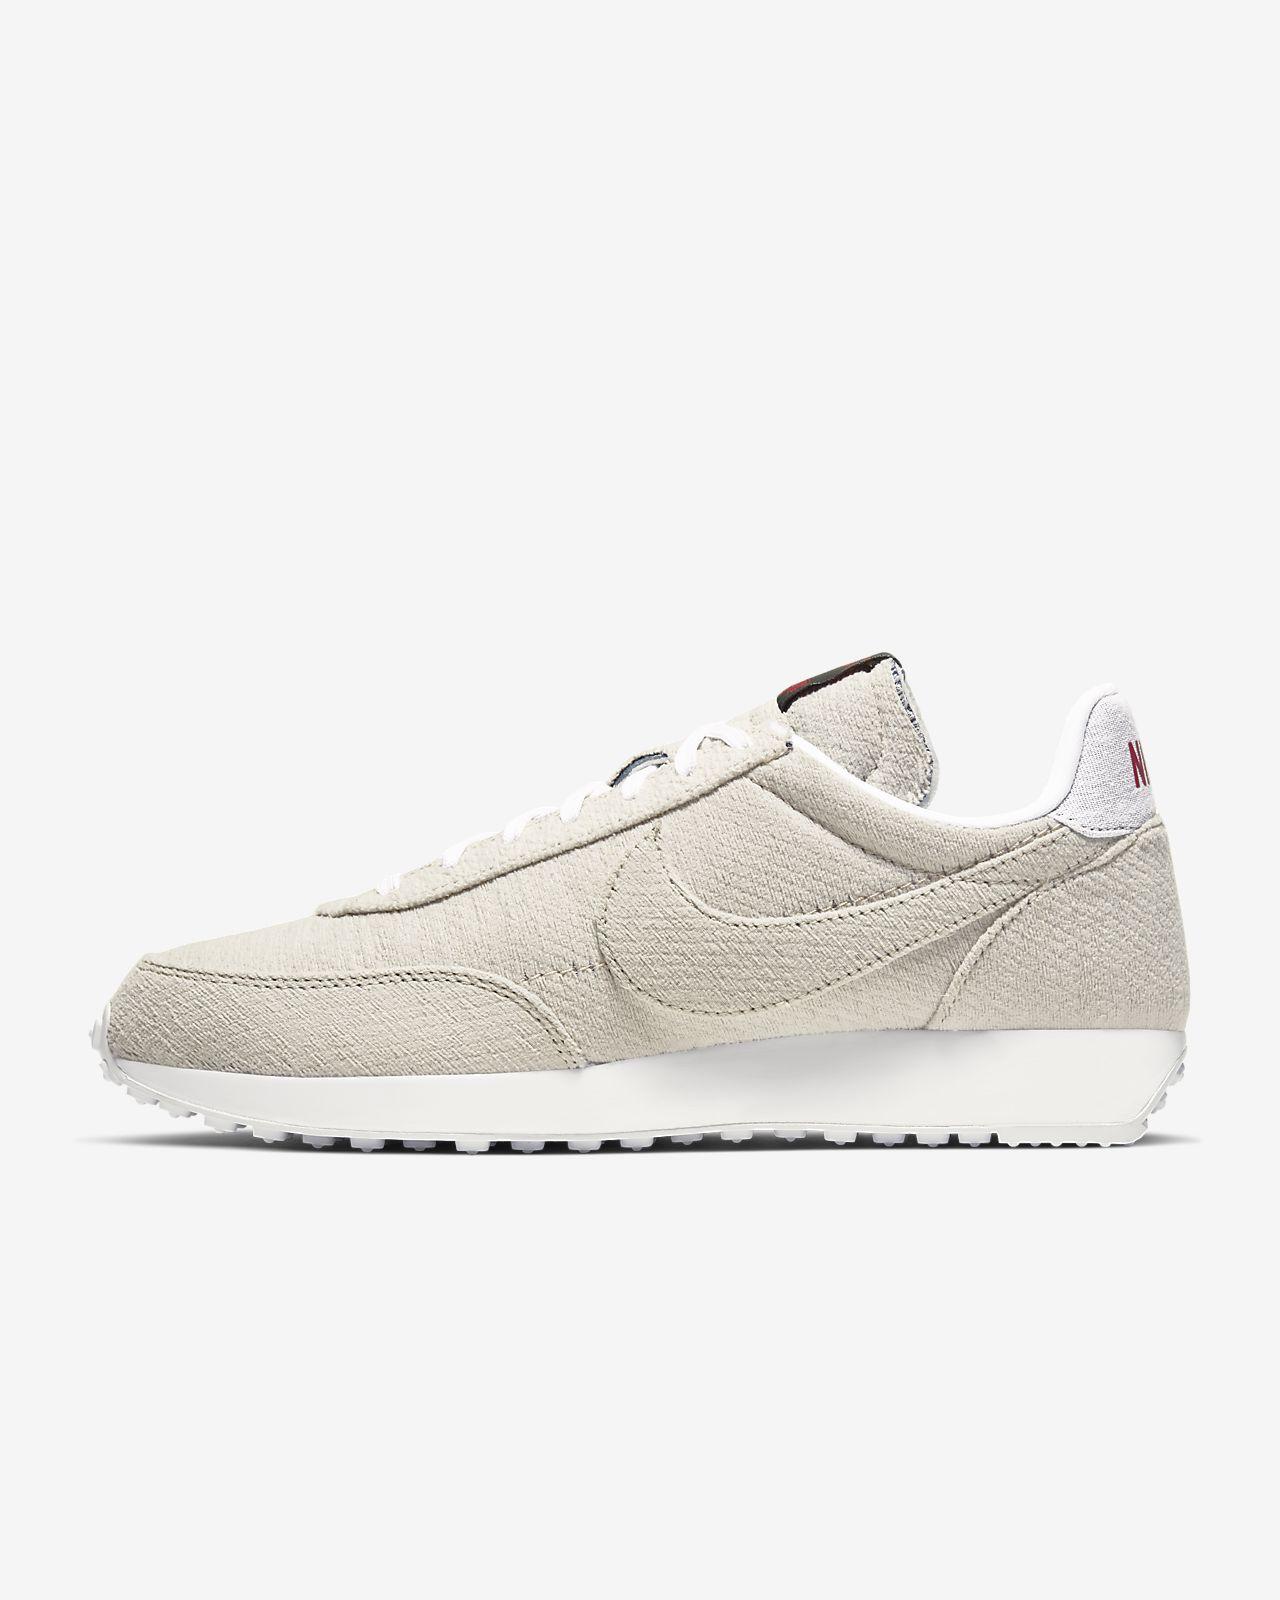 reputable site cb880 41251 Nike x Stranger Things Air Tailwind 79 'Upside Down' Men's Shoe